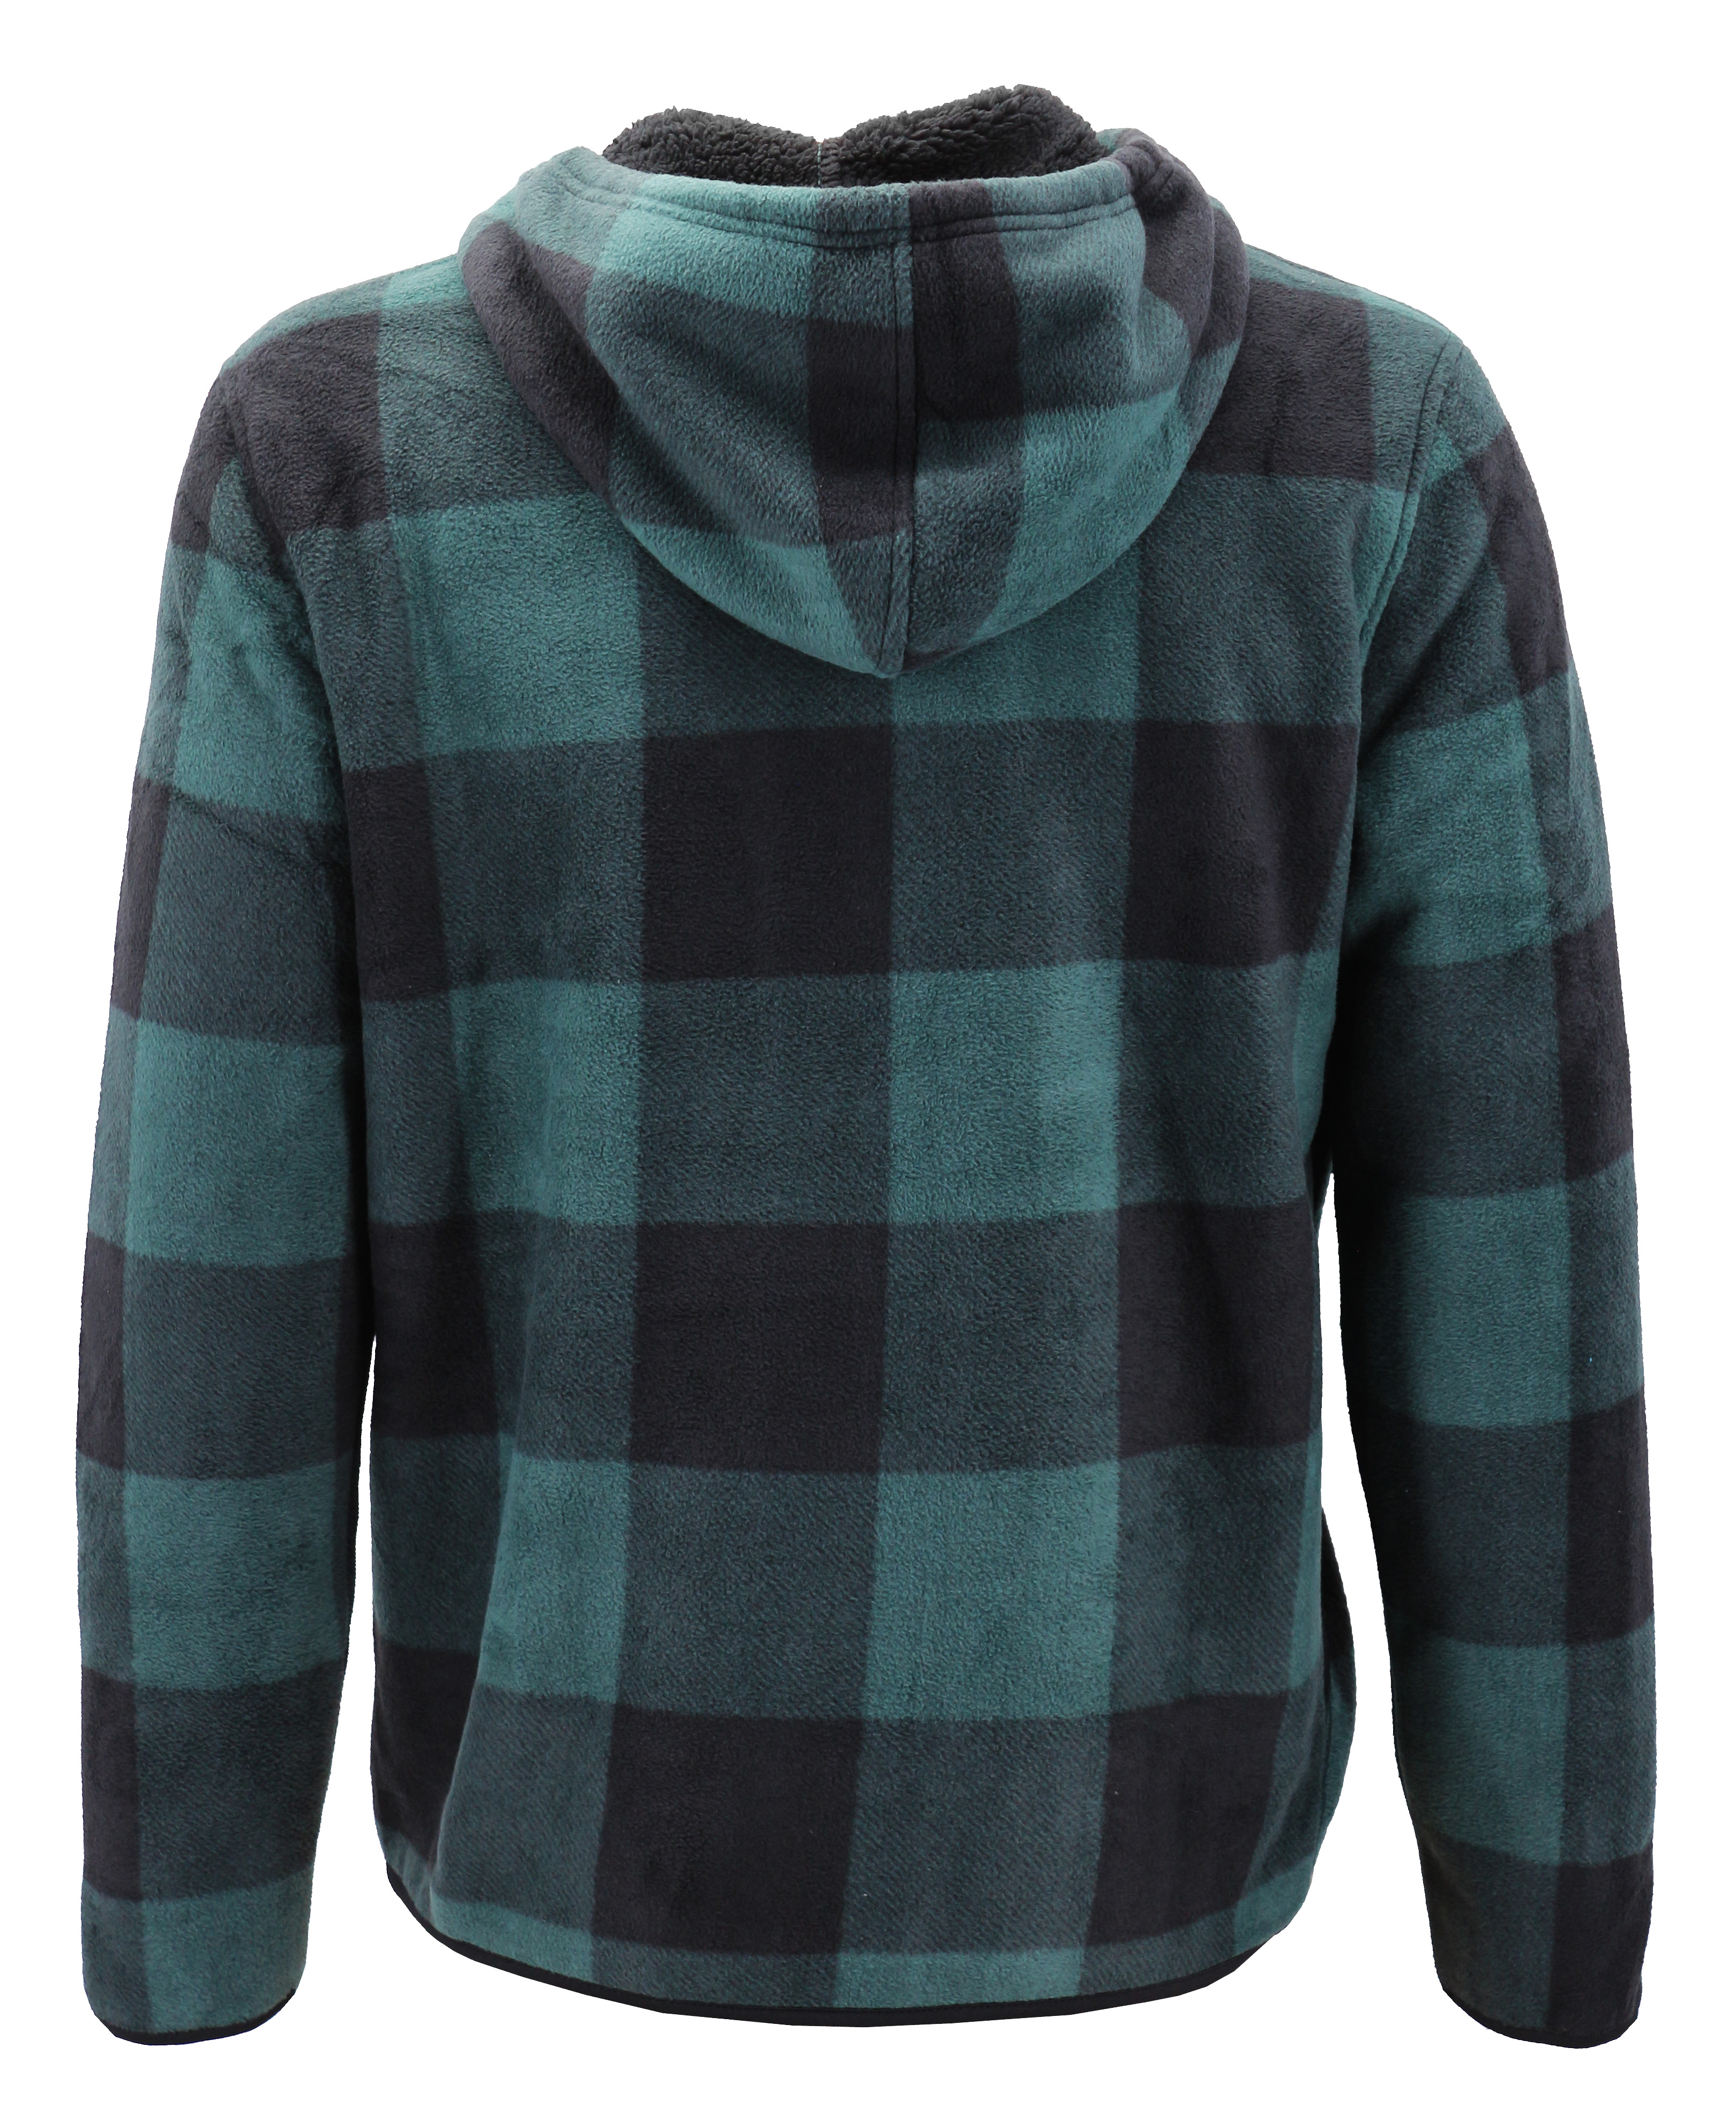 thumbnail 6 - Men-039-s-Casual-Flannel-Zip-Up-Fleece-Lined-Plaid-Sherpa-Hoodie-Lightweight-Jacket